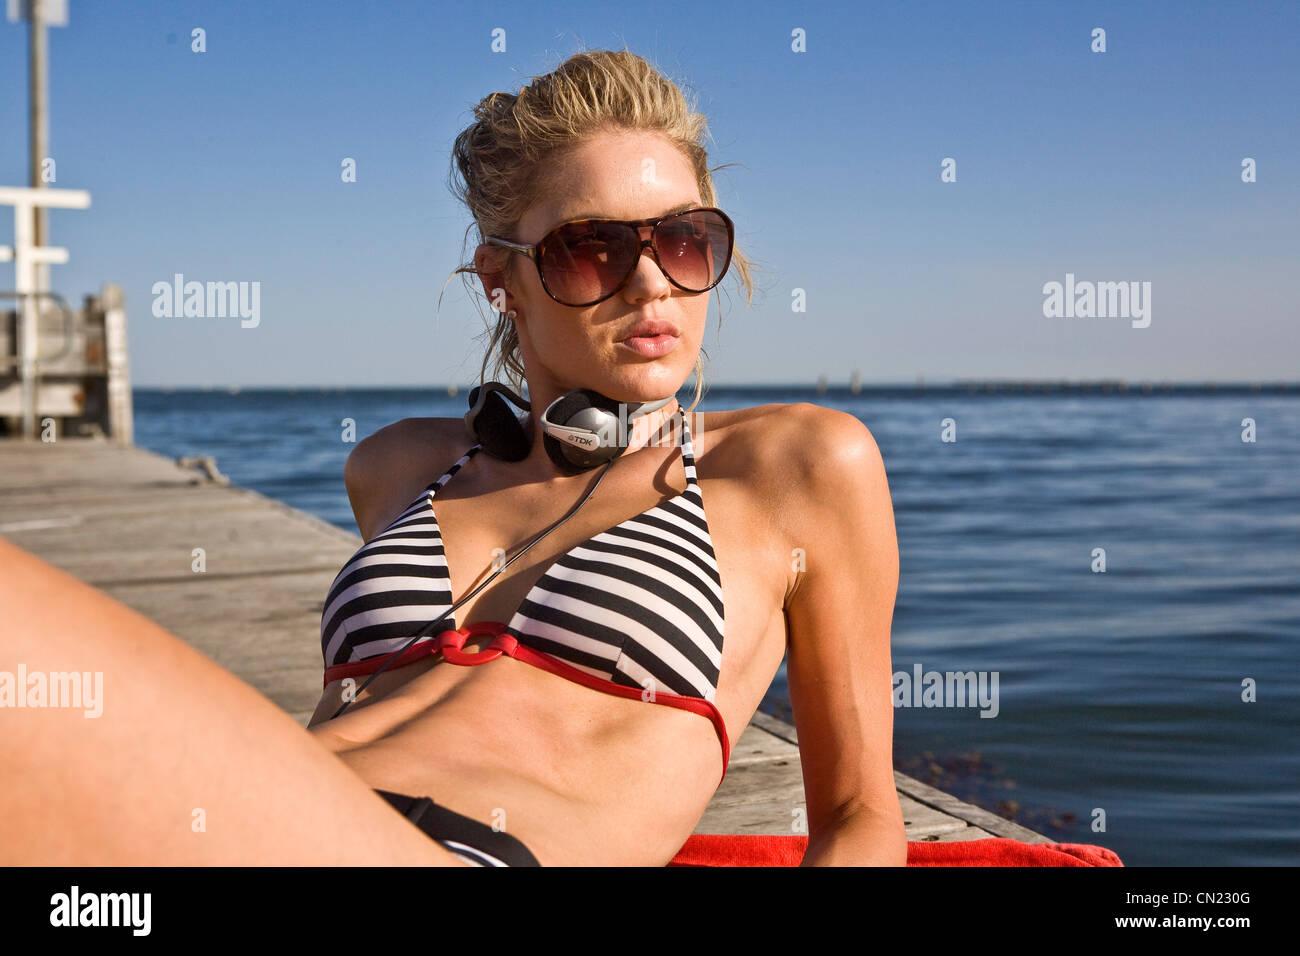 Young Woman Sunbathing on Pier - Stock Image